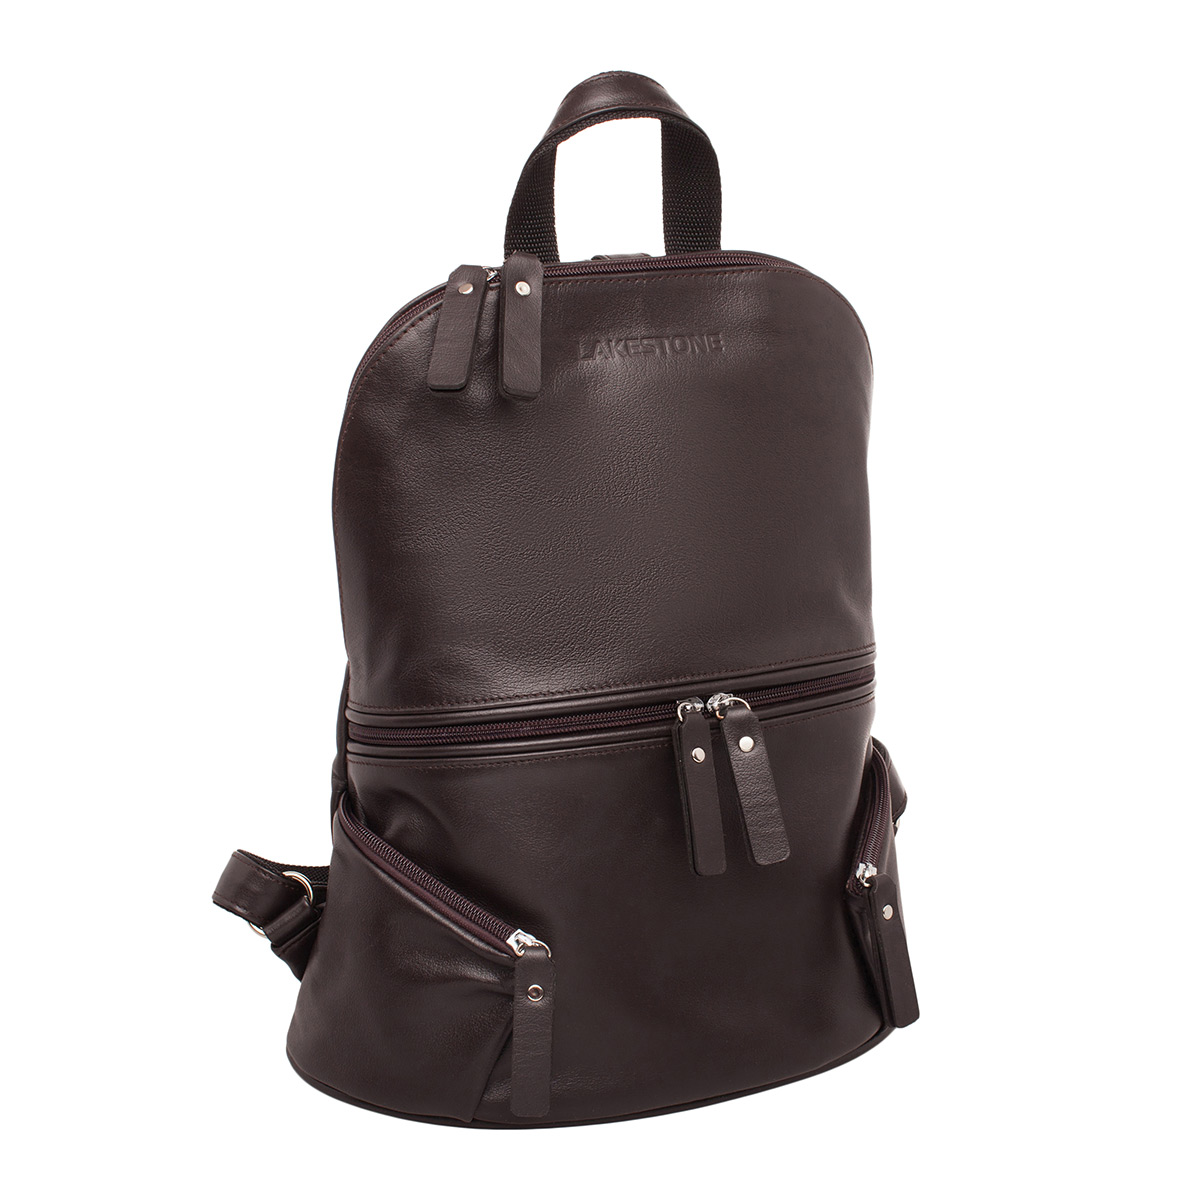 Рюкзак женский кожаный Lakestone 91235/BR